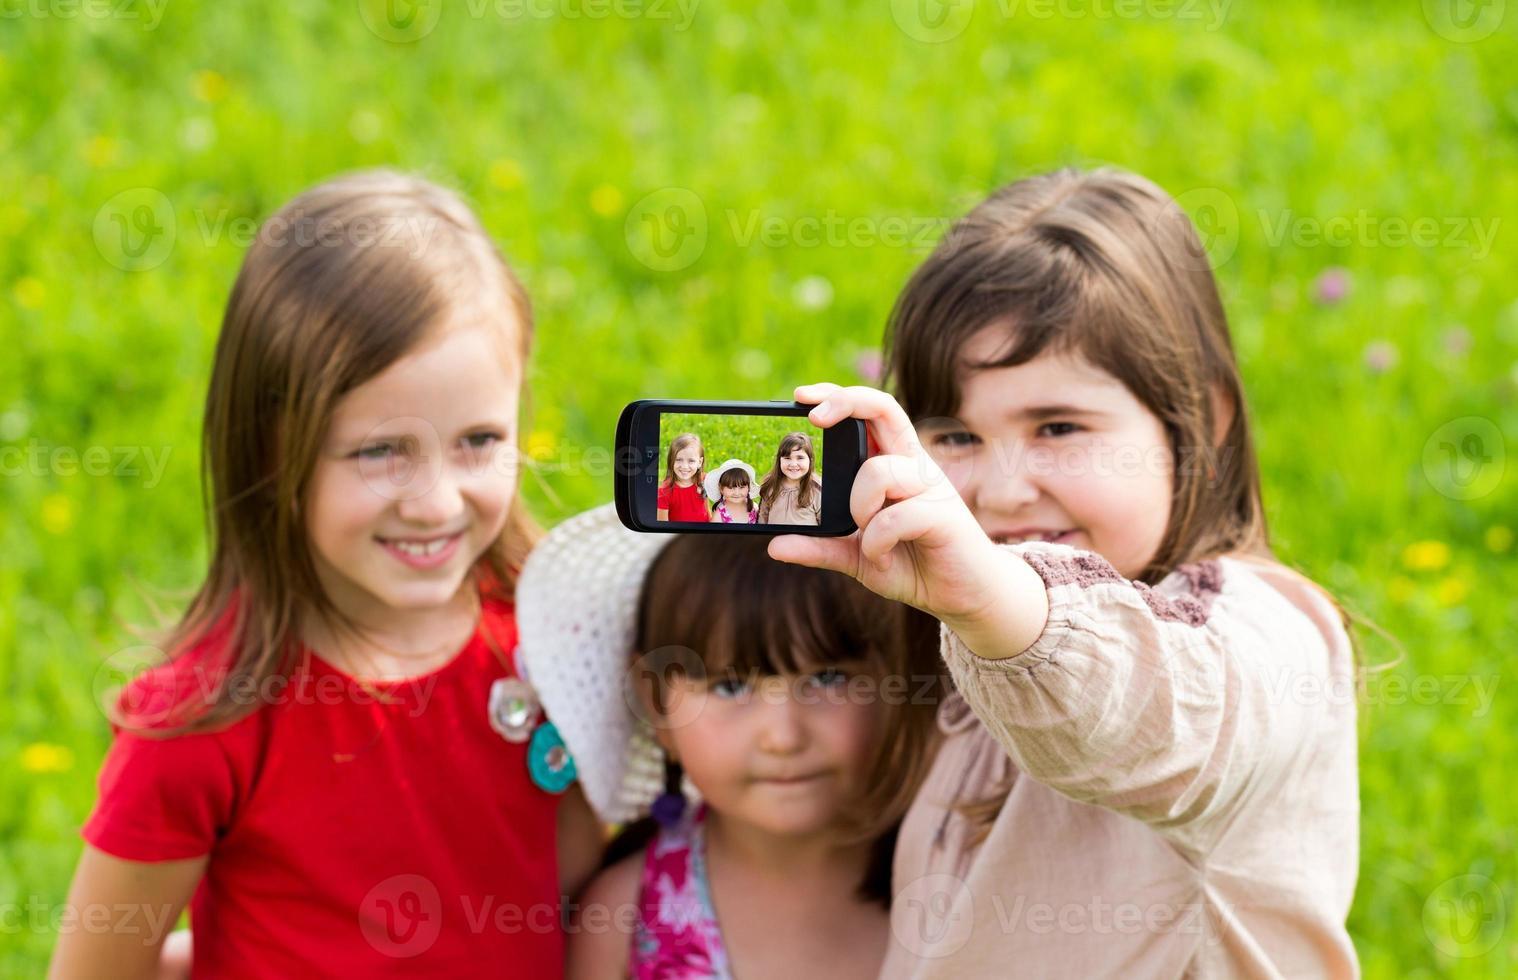 låt oss göra några selfies! foto